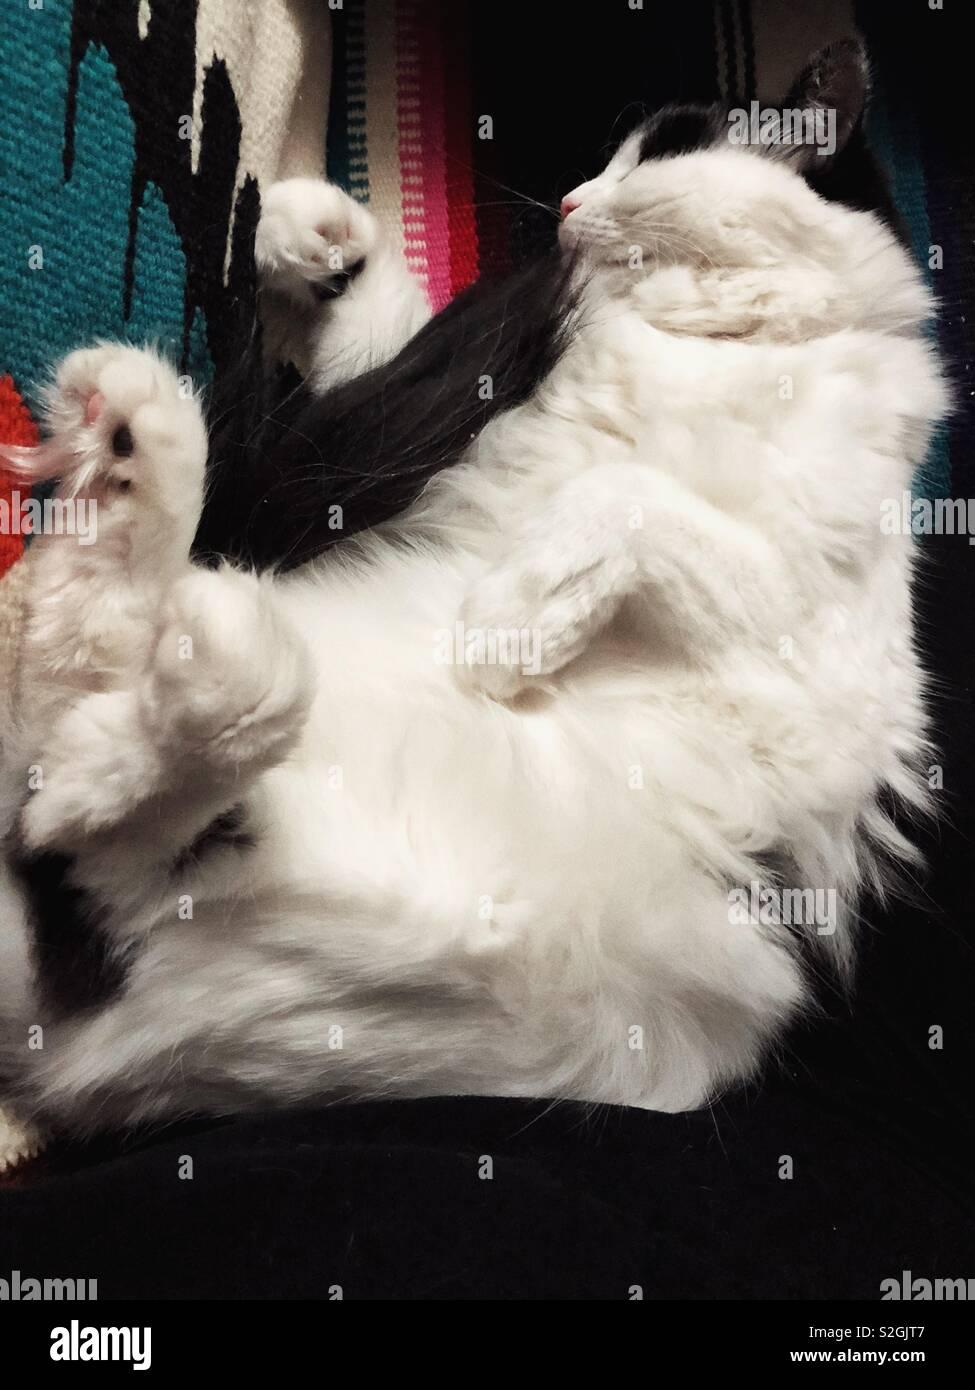 Cat White Animal Meme Confused Looks Wwwtollebildcom